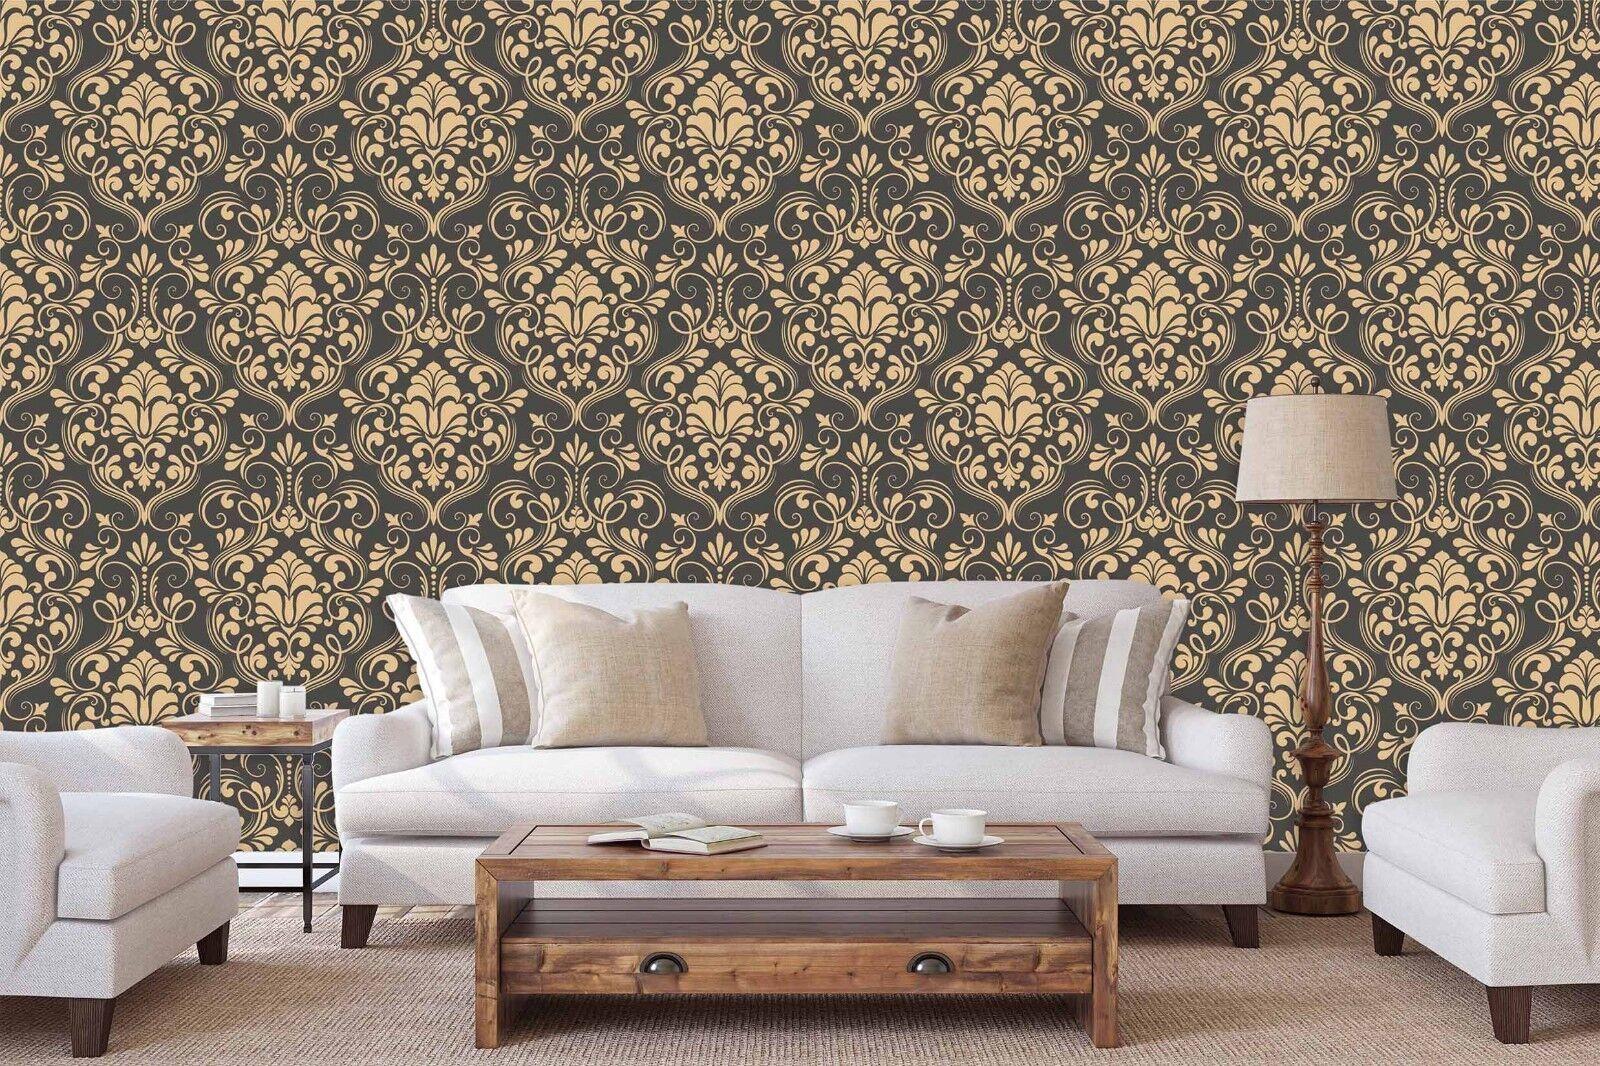 3D Golden Floral 739 Wall Paper Print Wall Decal Deco Indoor Wall Murals US